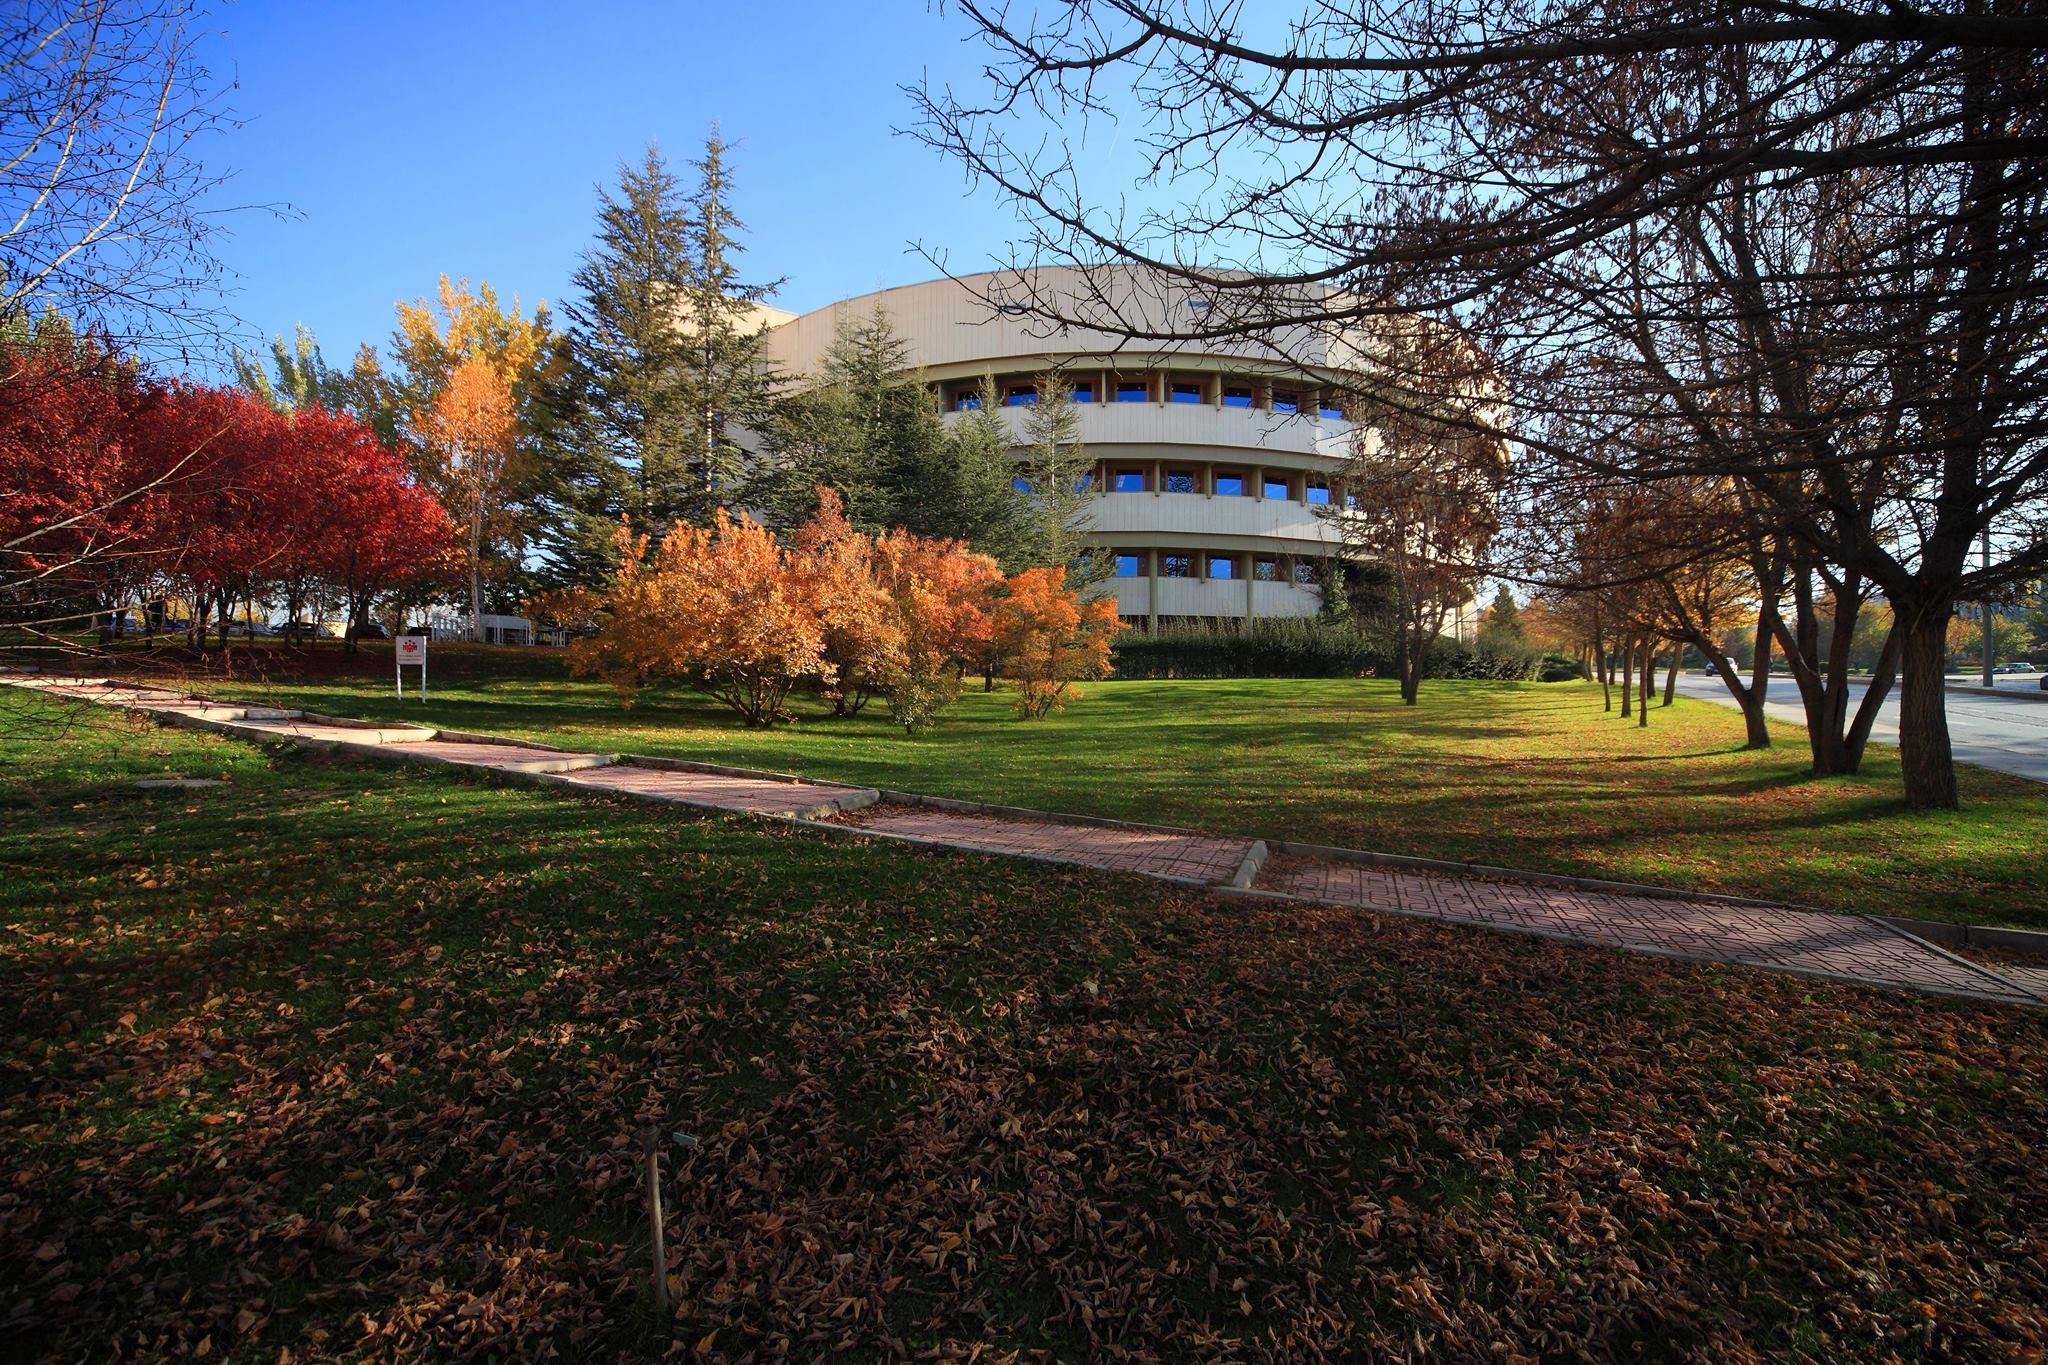 Bilkent University Campus